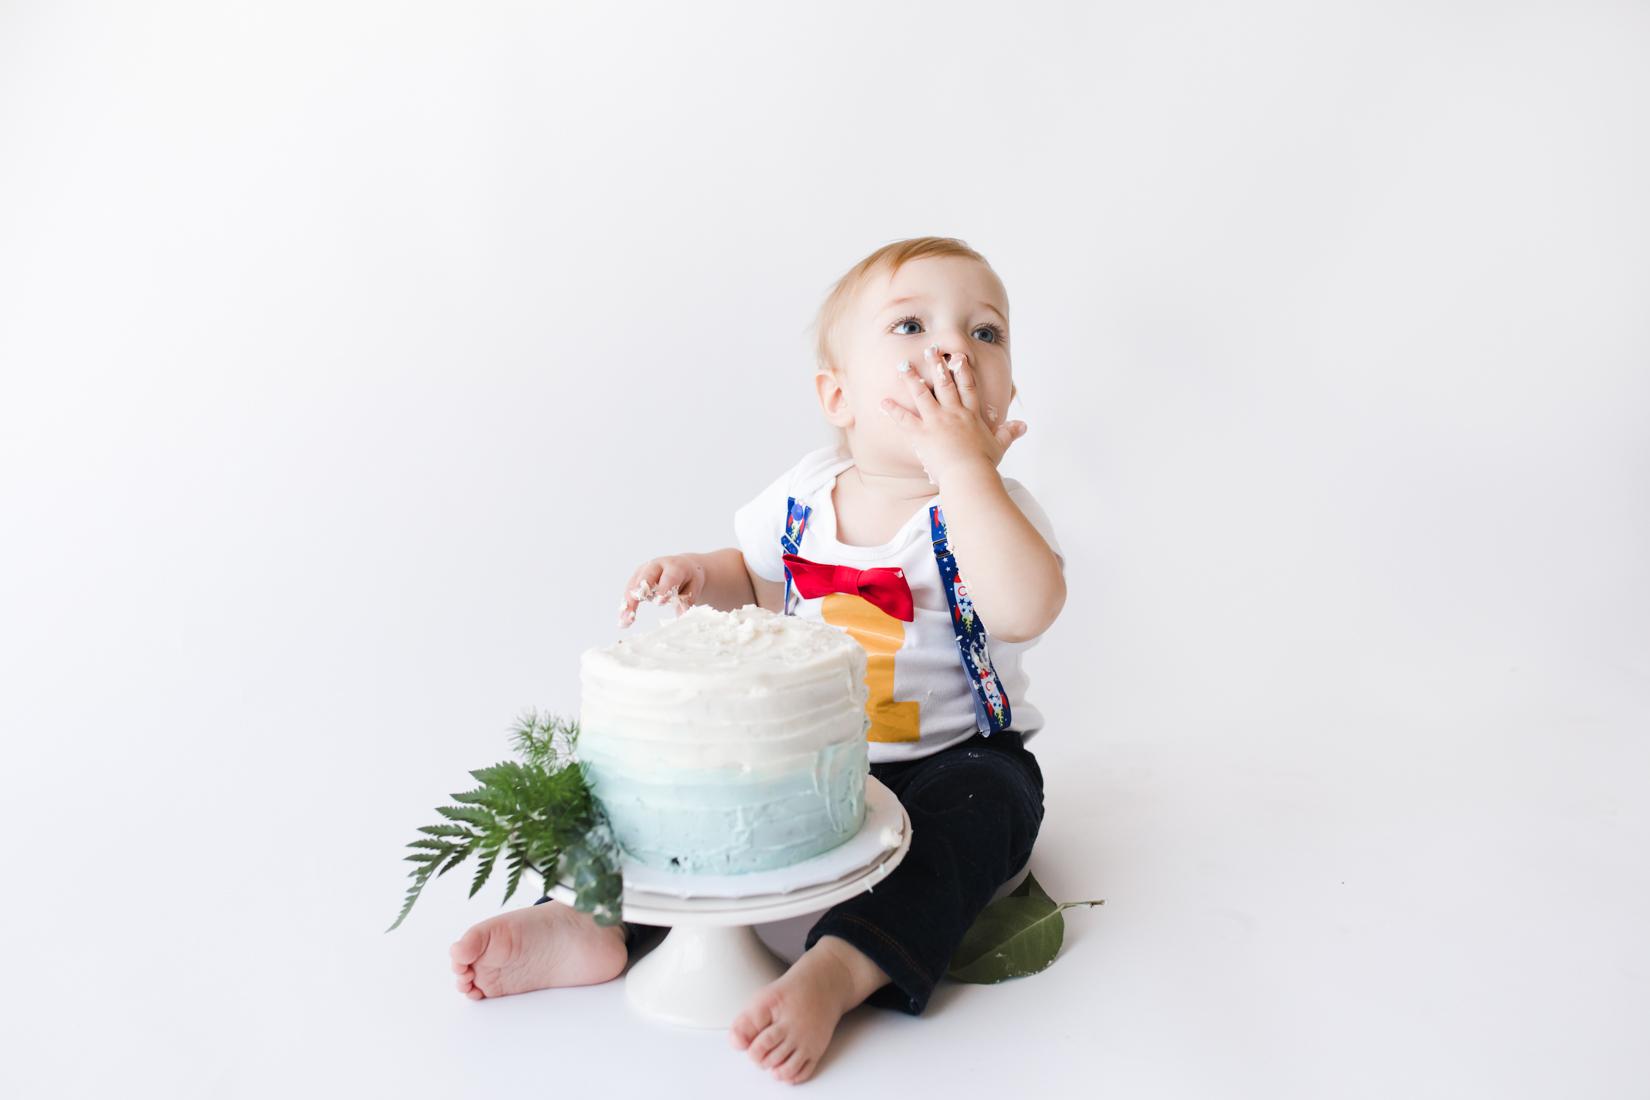 Groovy Cake Smash Otto Is One Phoenix Arizona Acapello Photography Birthday Cards Printable Trancafe Filternl